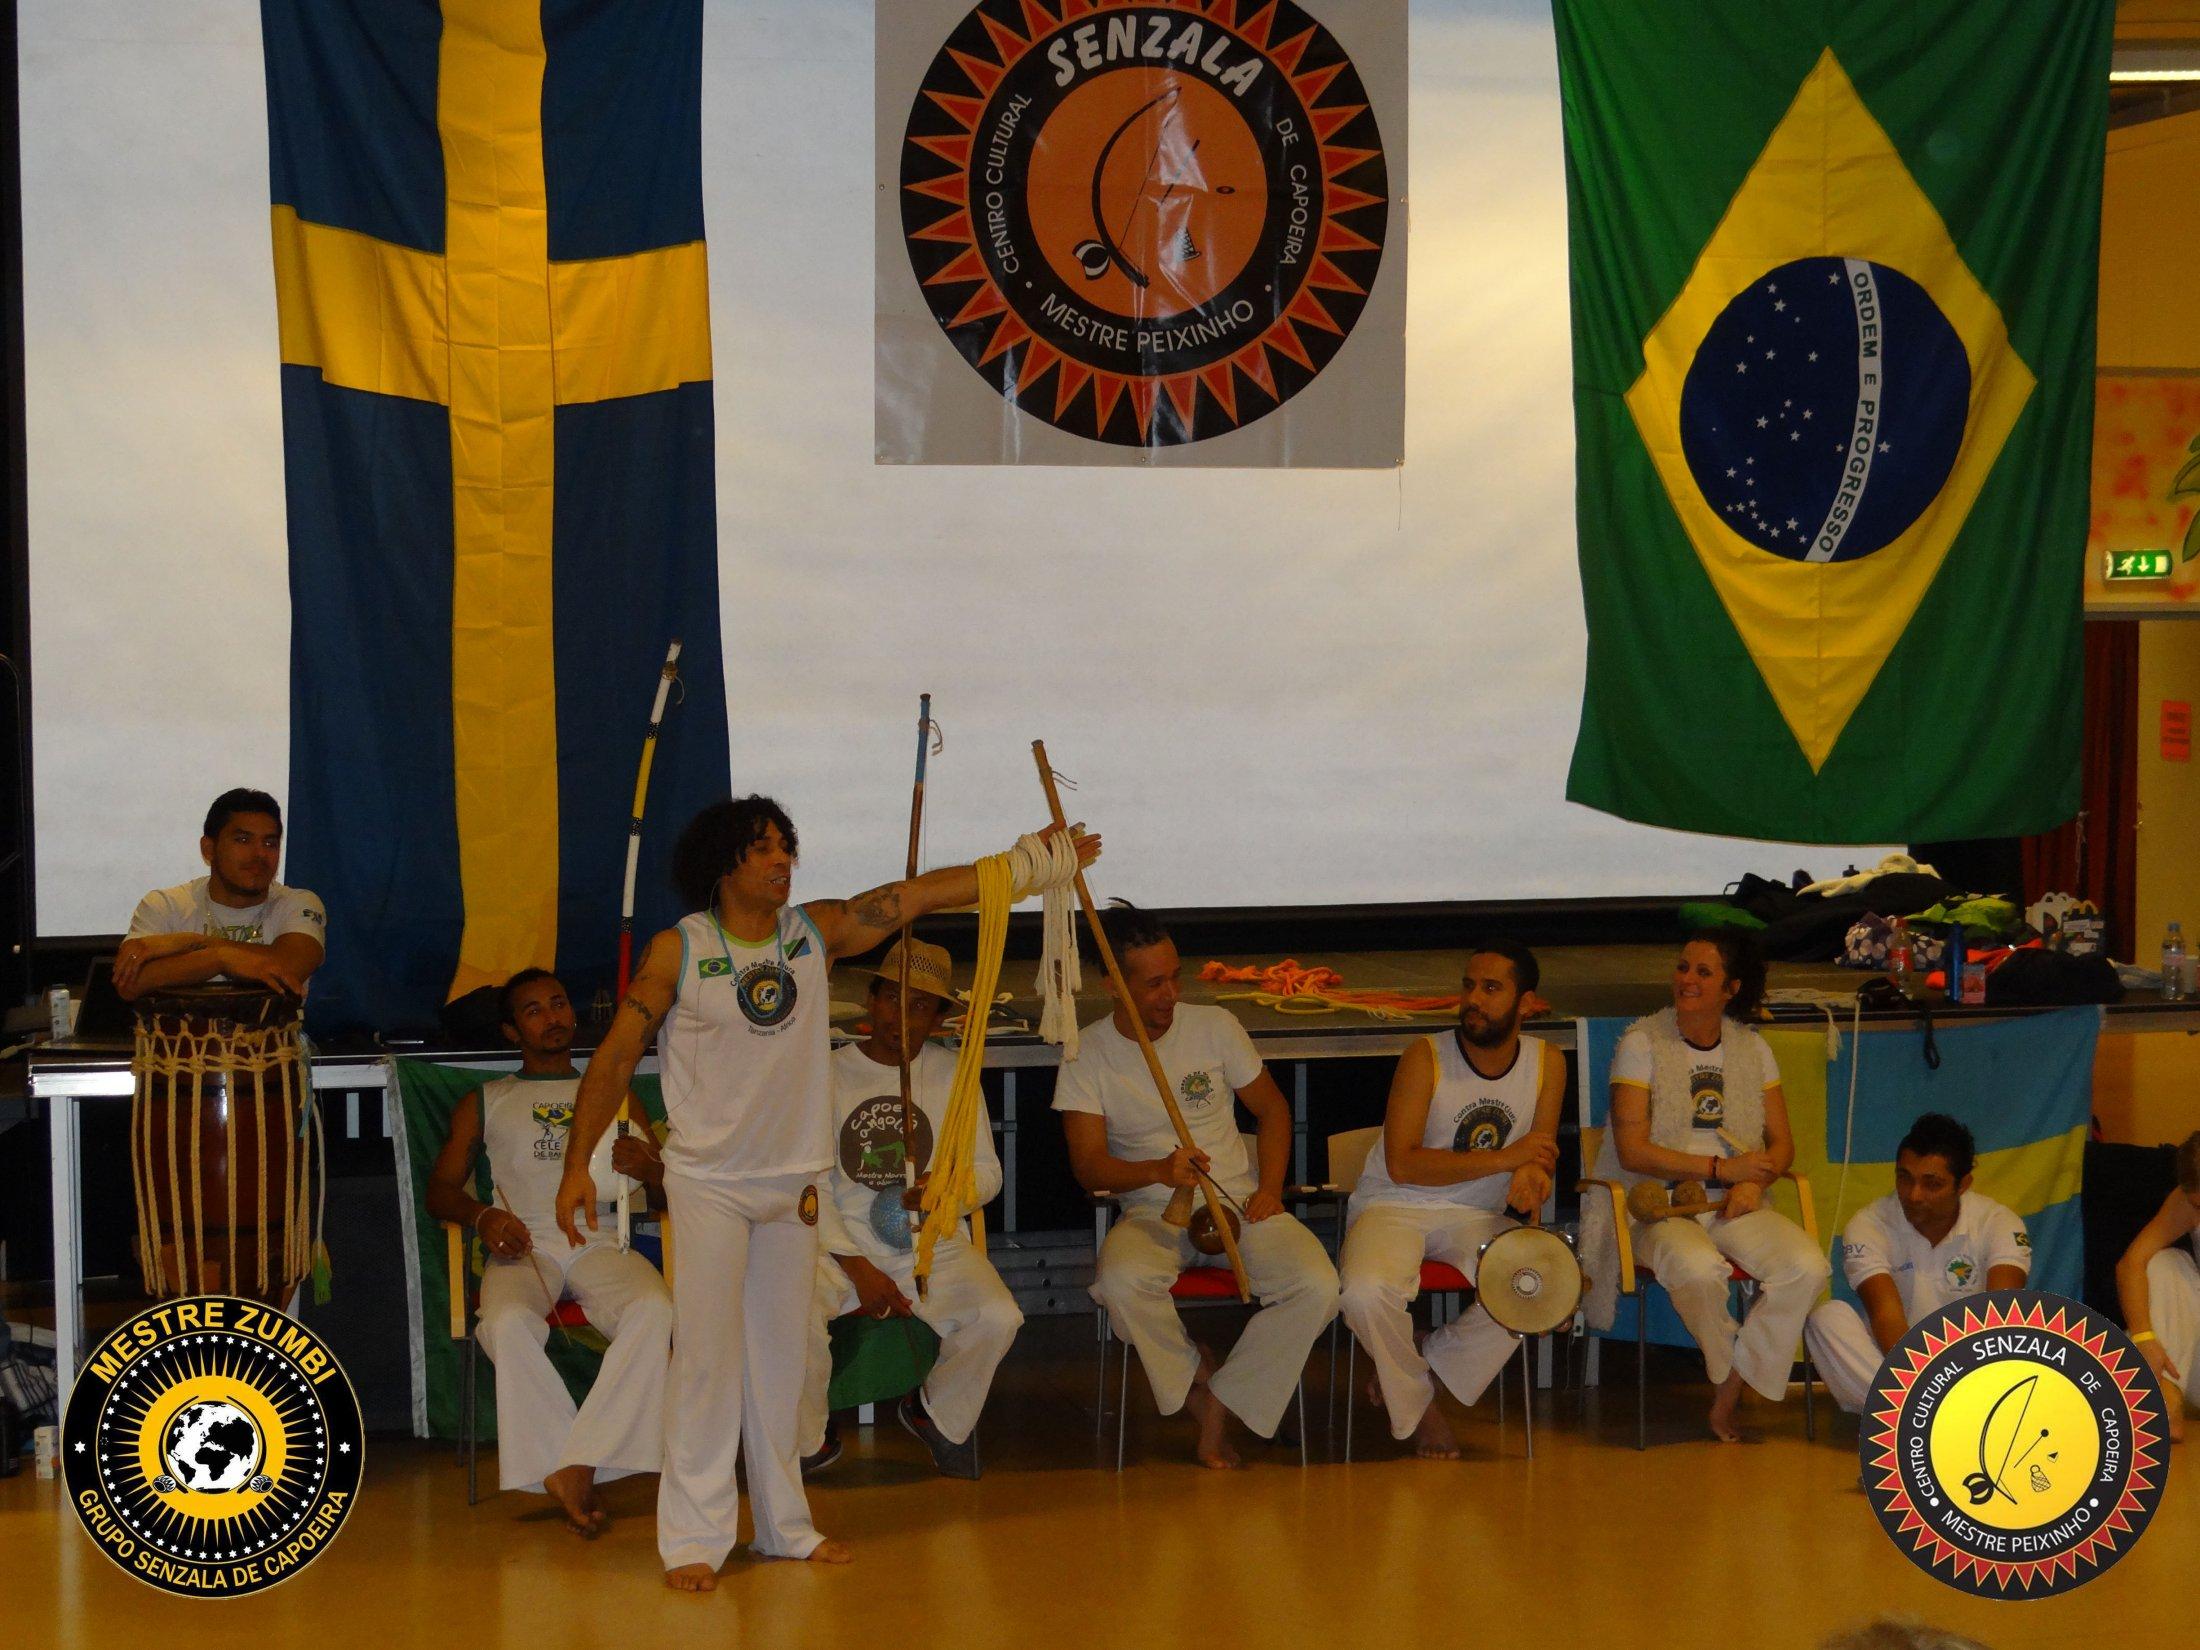 2013-12-14 - Capoeira 072